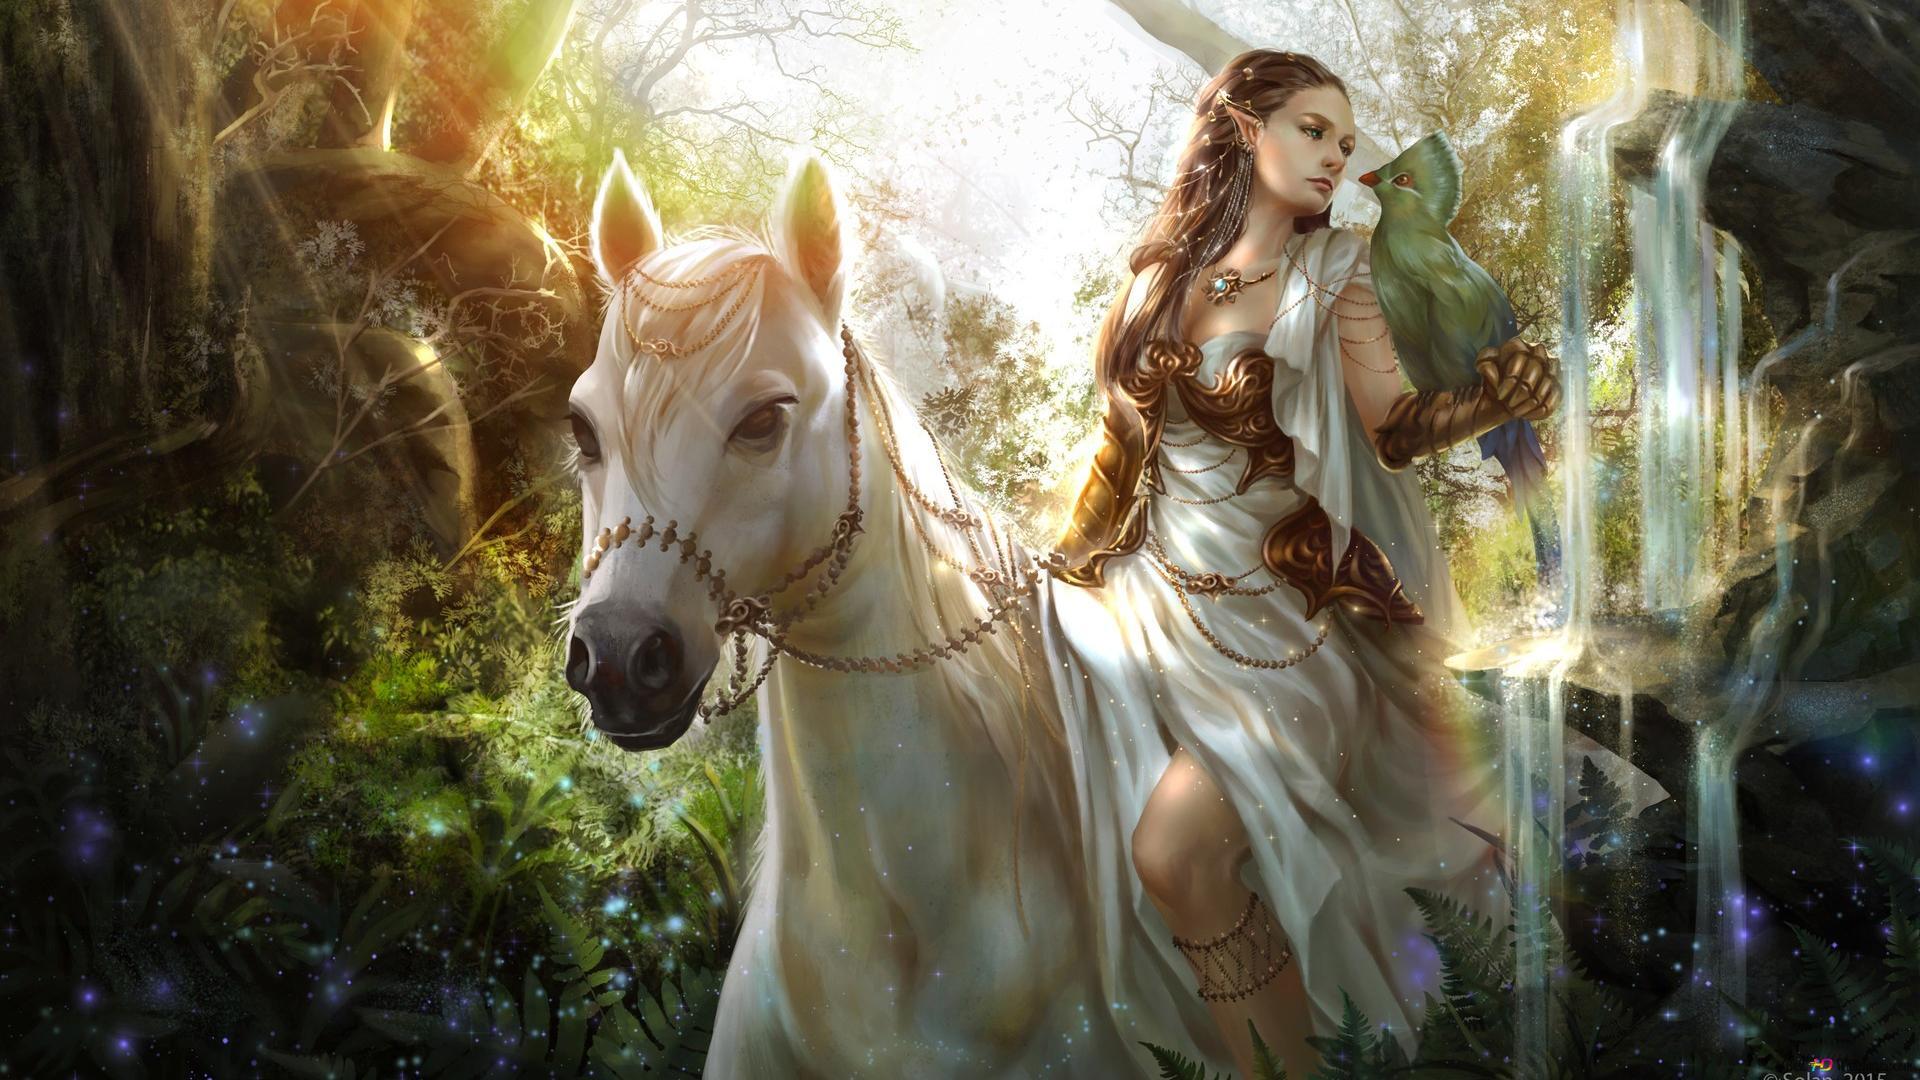 Fantasy Girl On Horse Hd Wallpaper Download